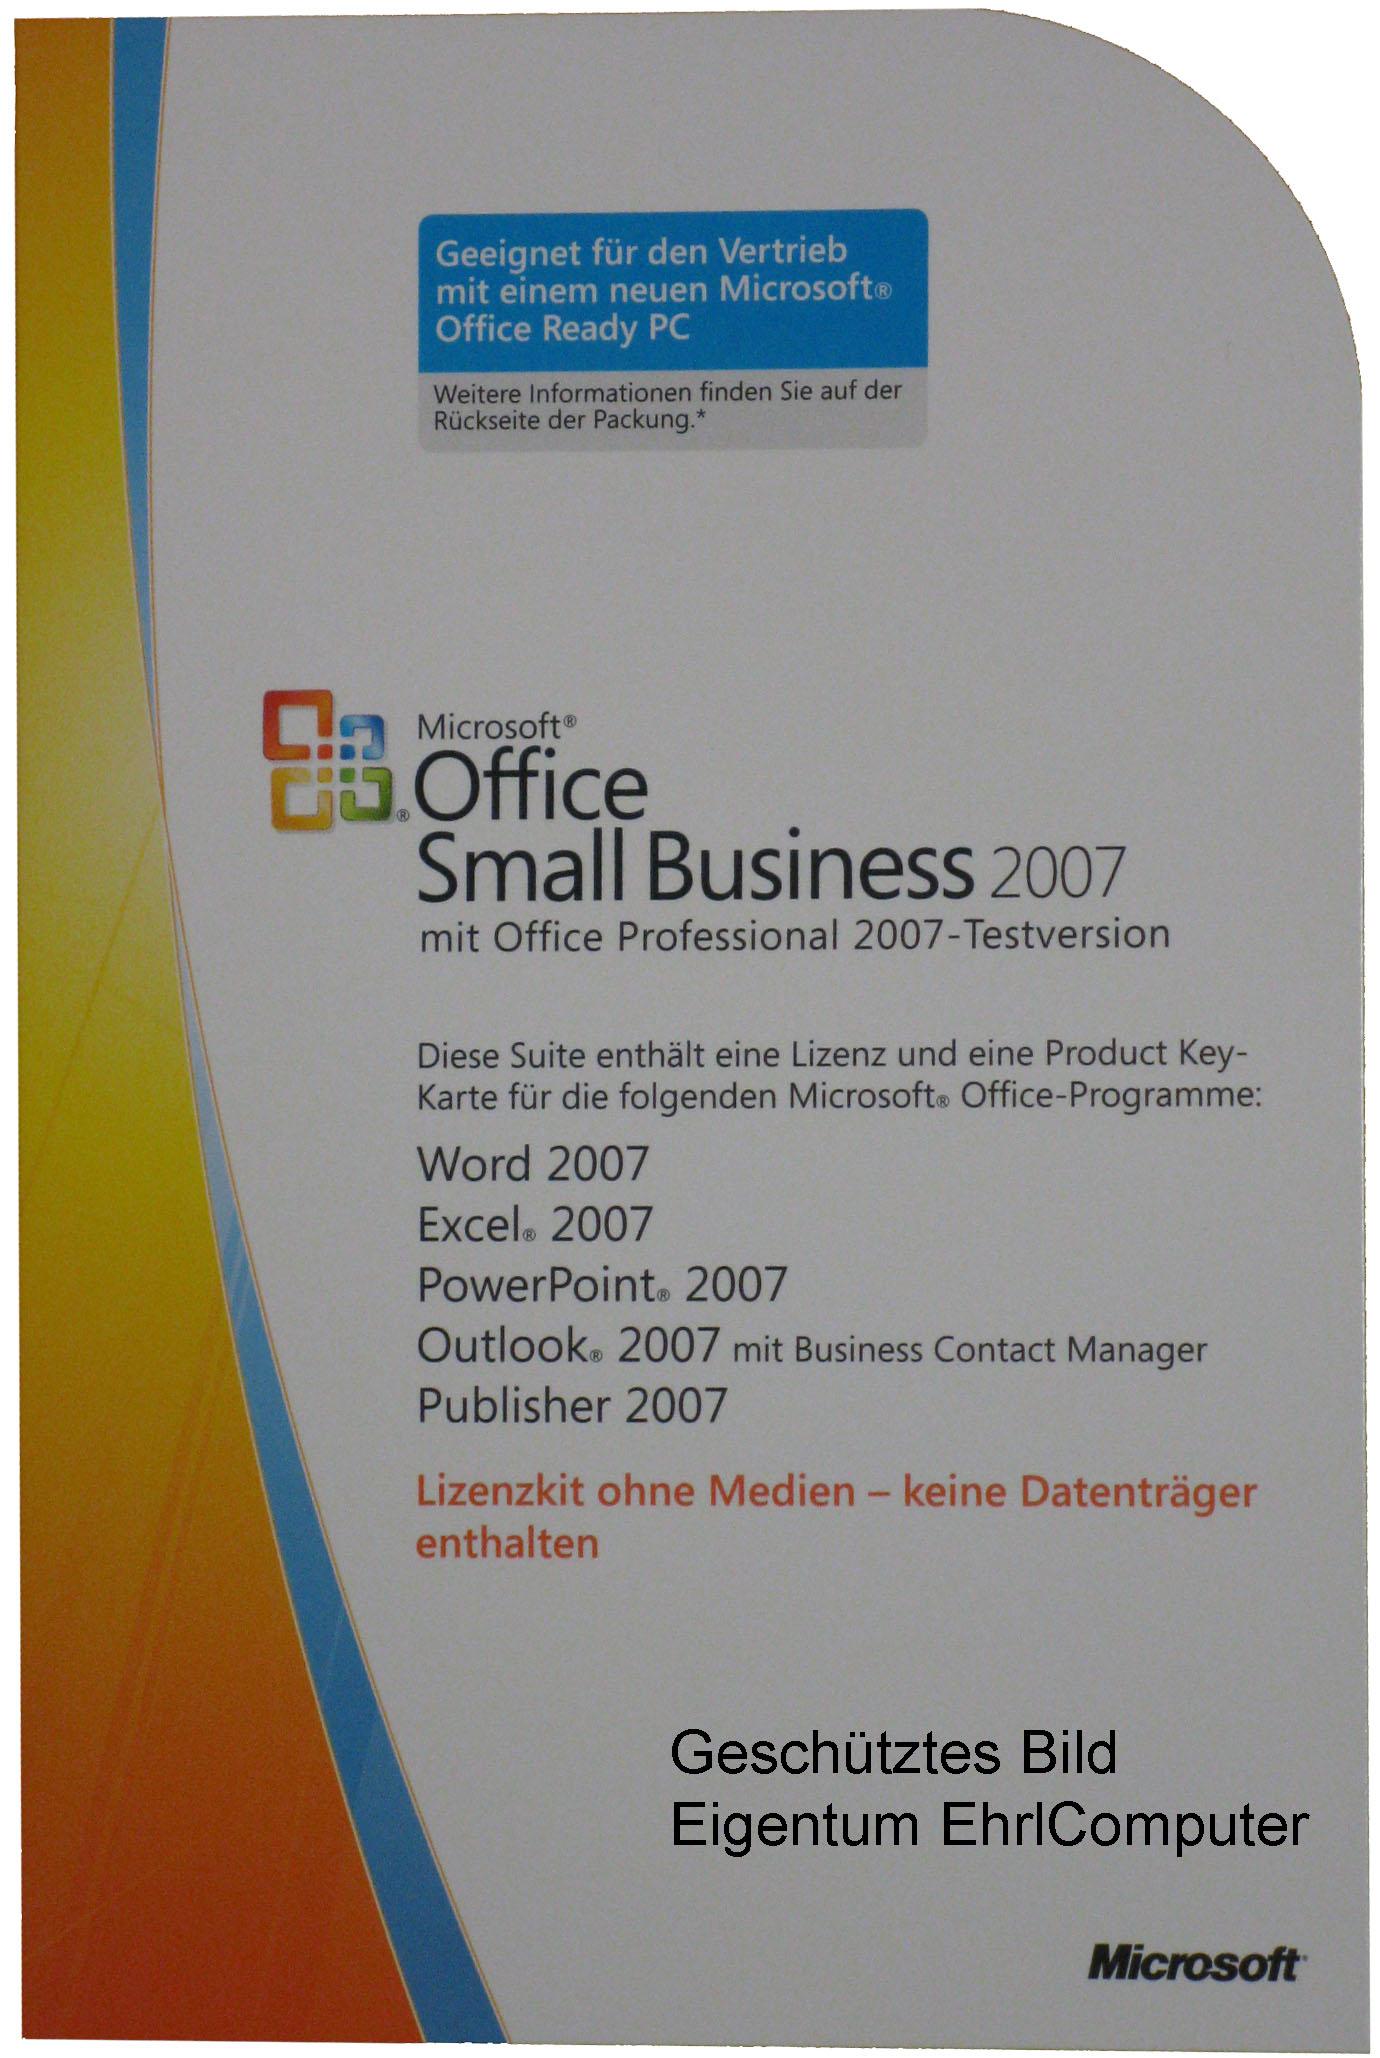 microsoft office small business 2007 key